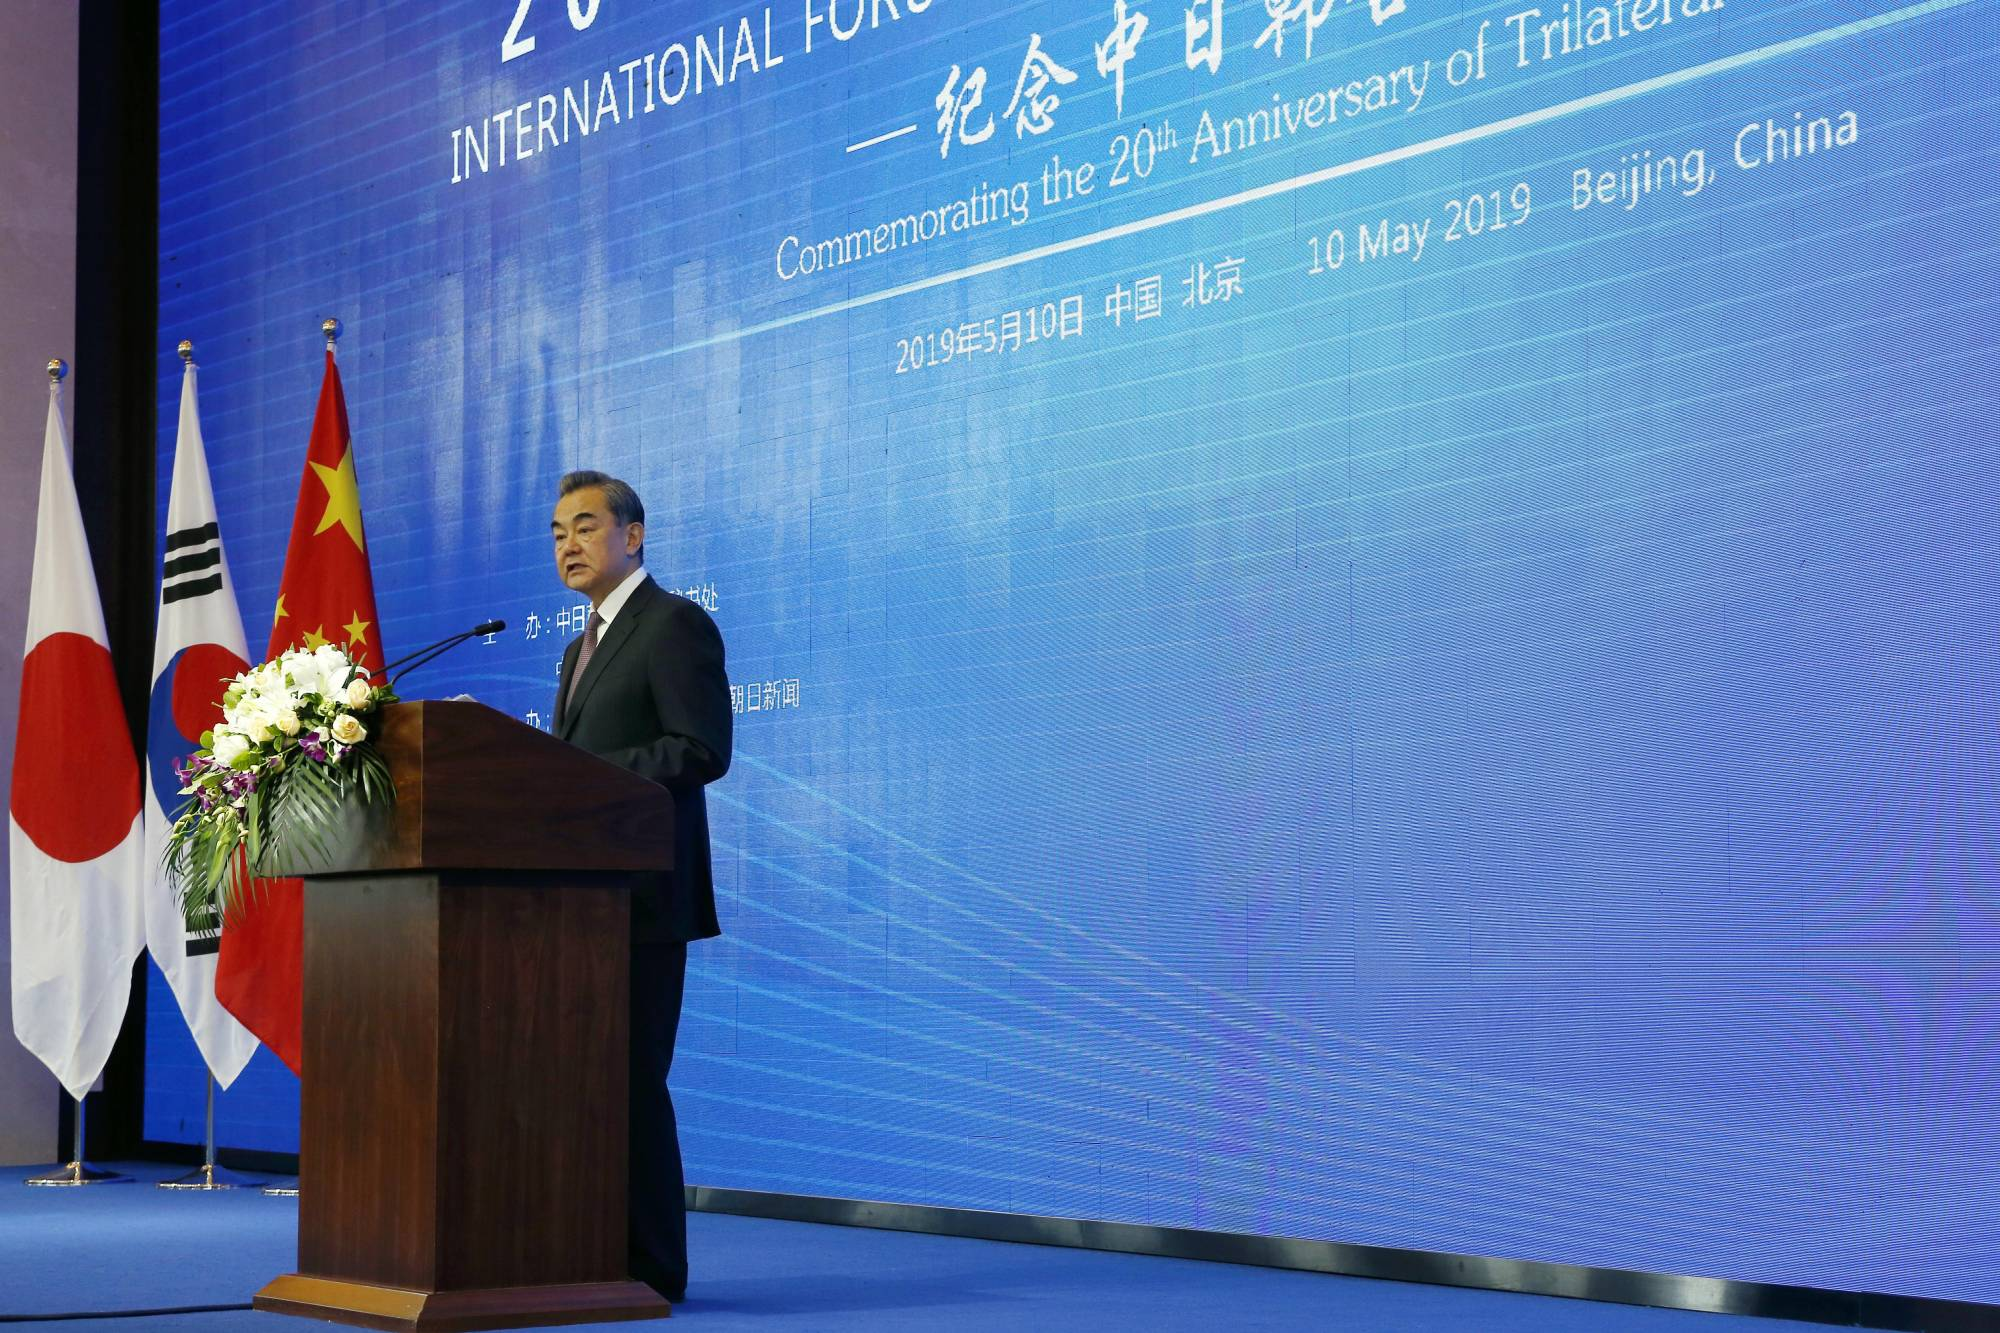 Vice President of China Public Diplomacy Association Hu Zhengyue Visits China